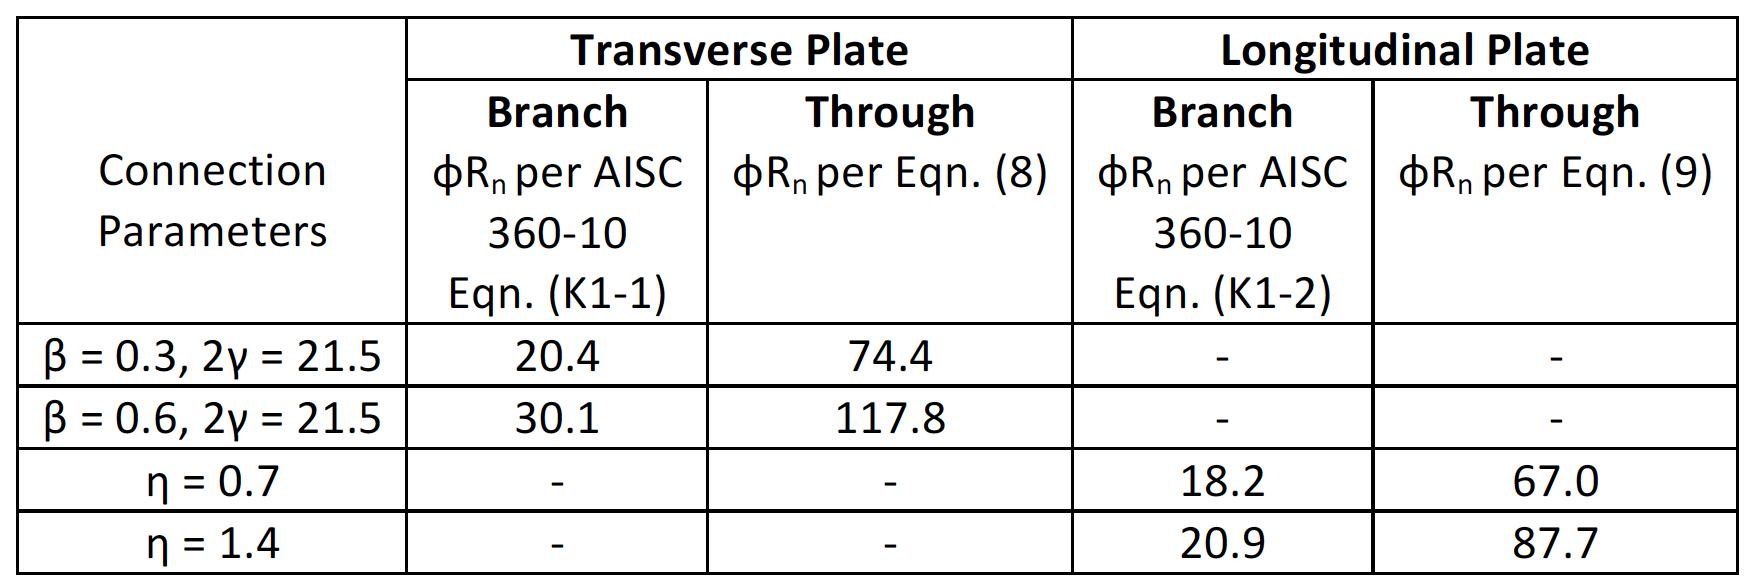 Transverse Plate and Longitudinal Plate Table